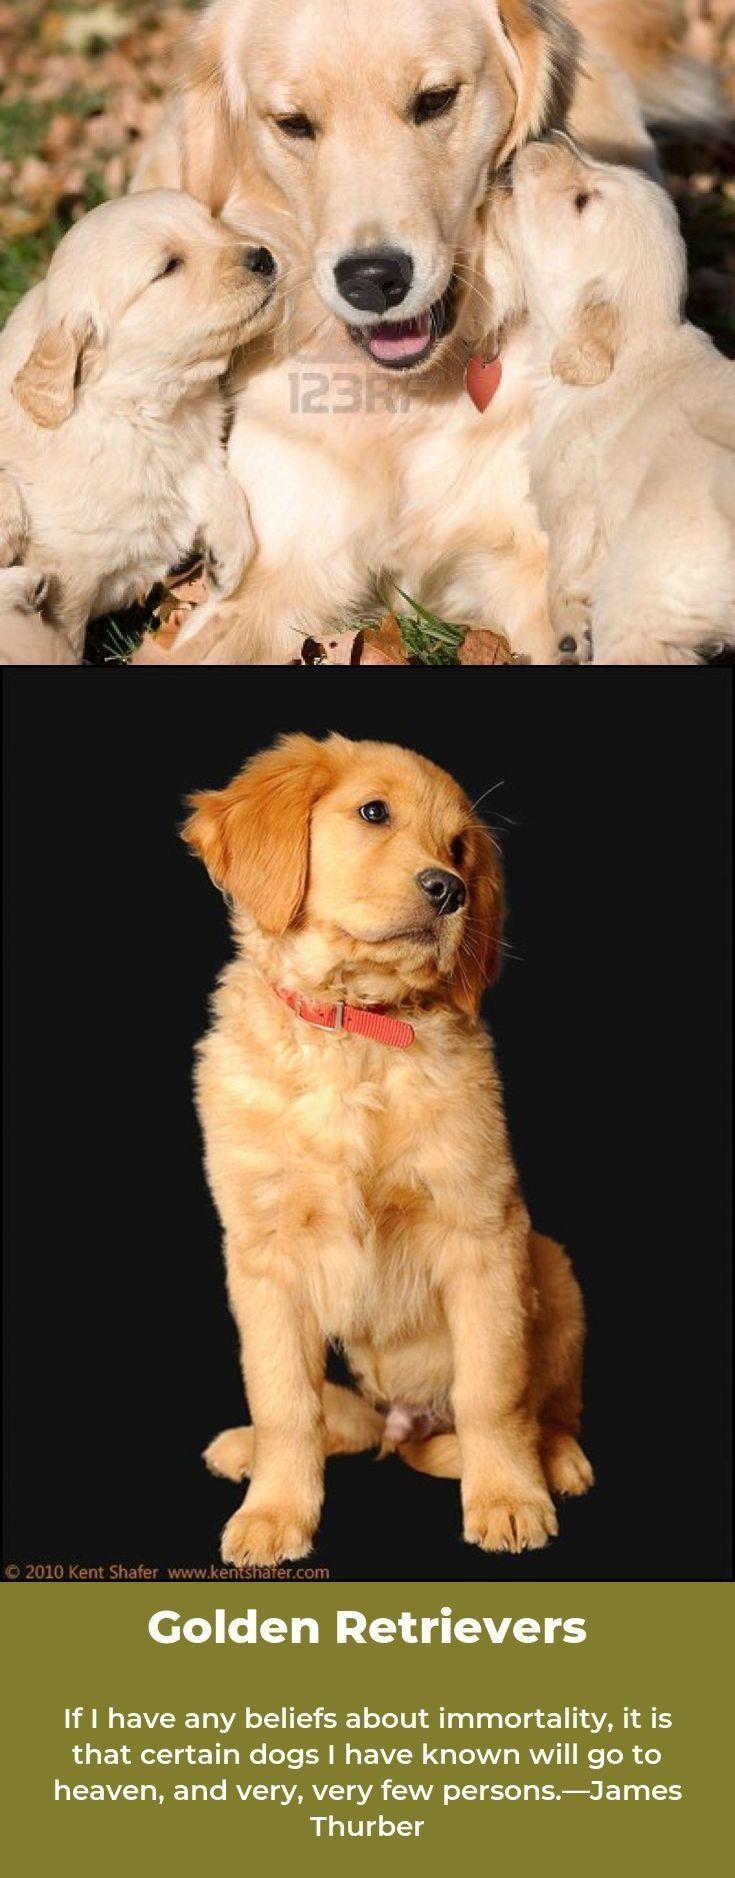 Golden Retriever Puppies Goldenretrievertee